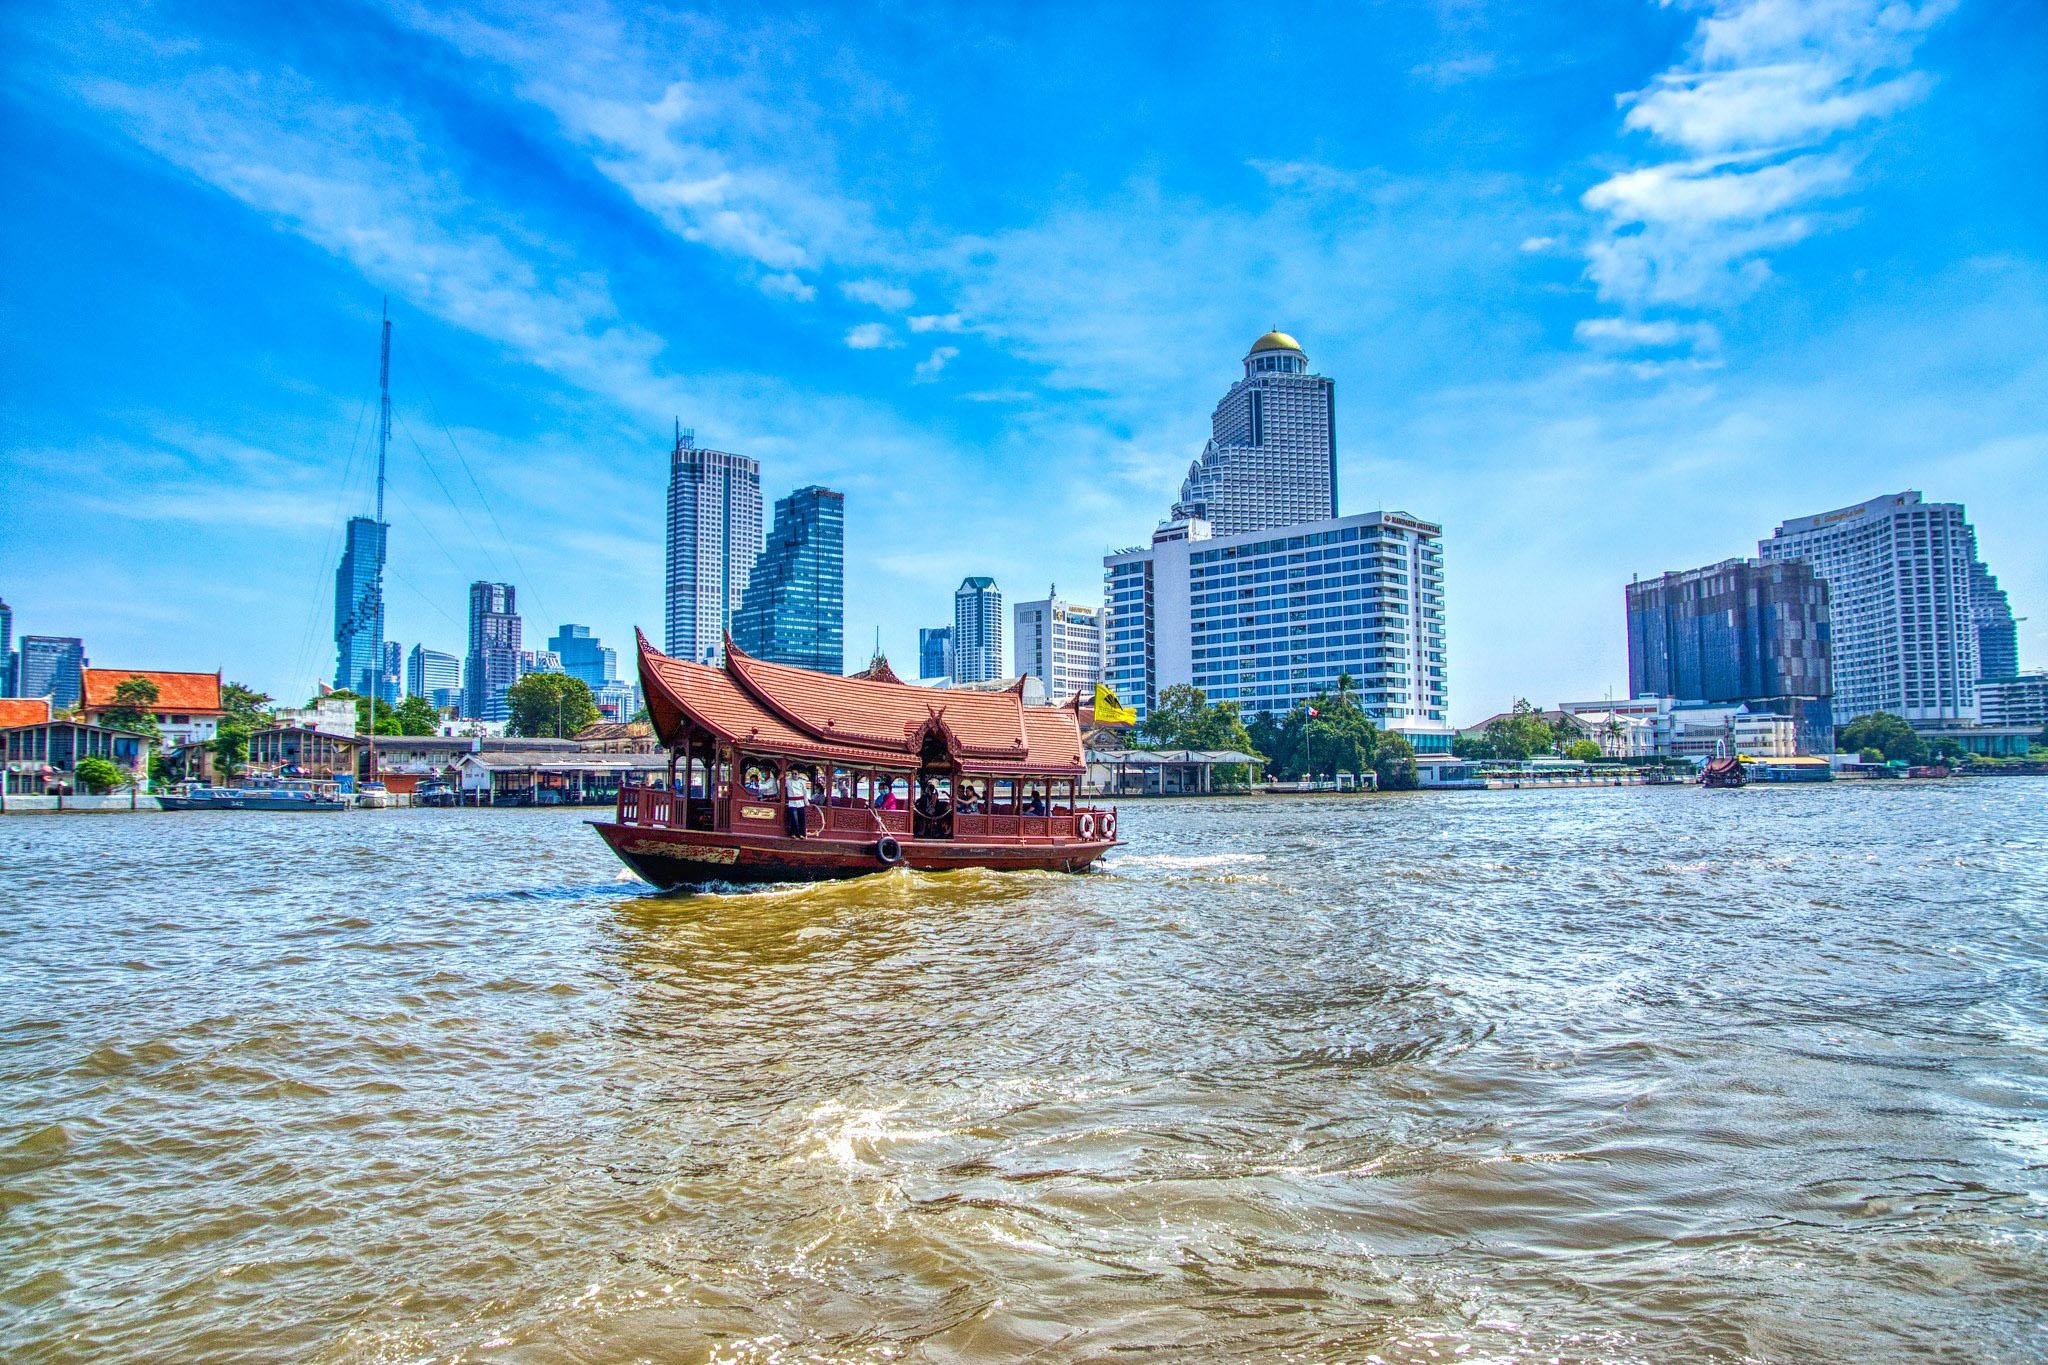 Shuttle boat of the Mandarin Oriental hotel on the Chao Phraya river by Uwe Schwarzbach.jpg